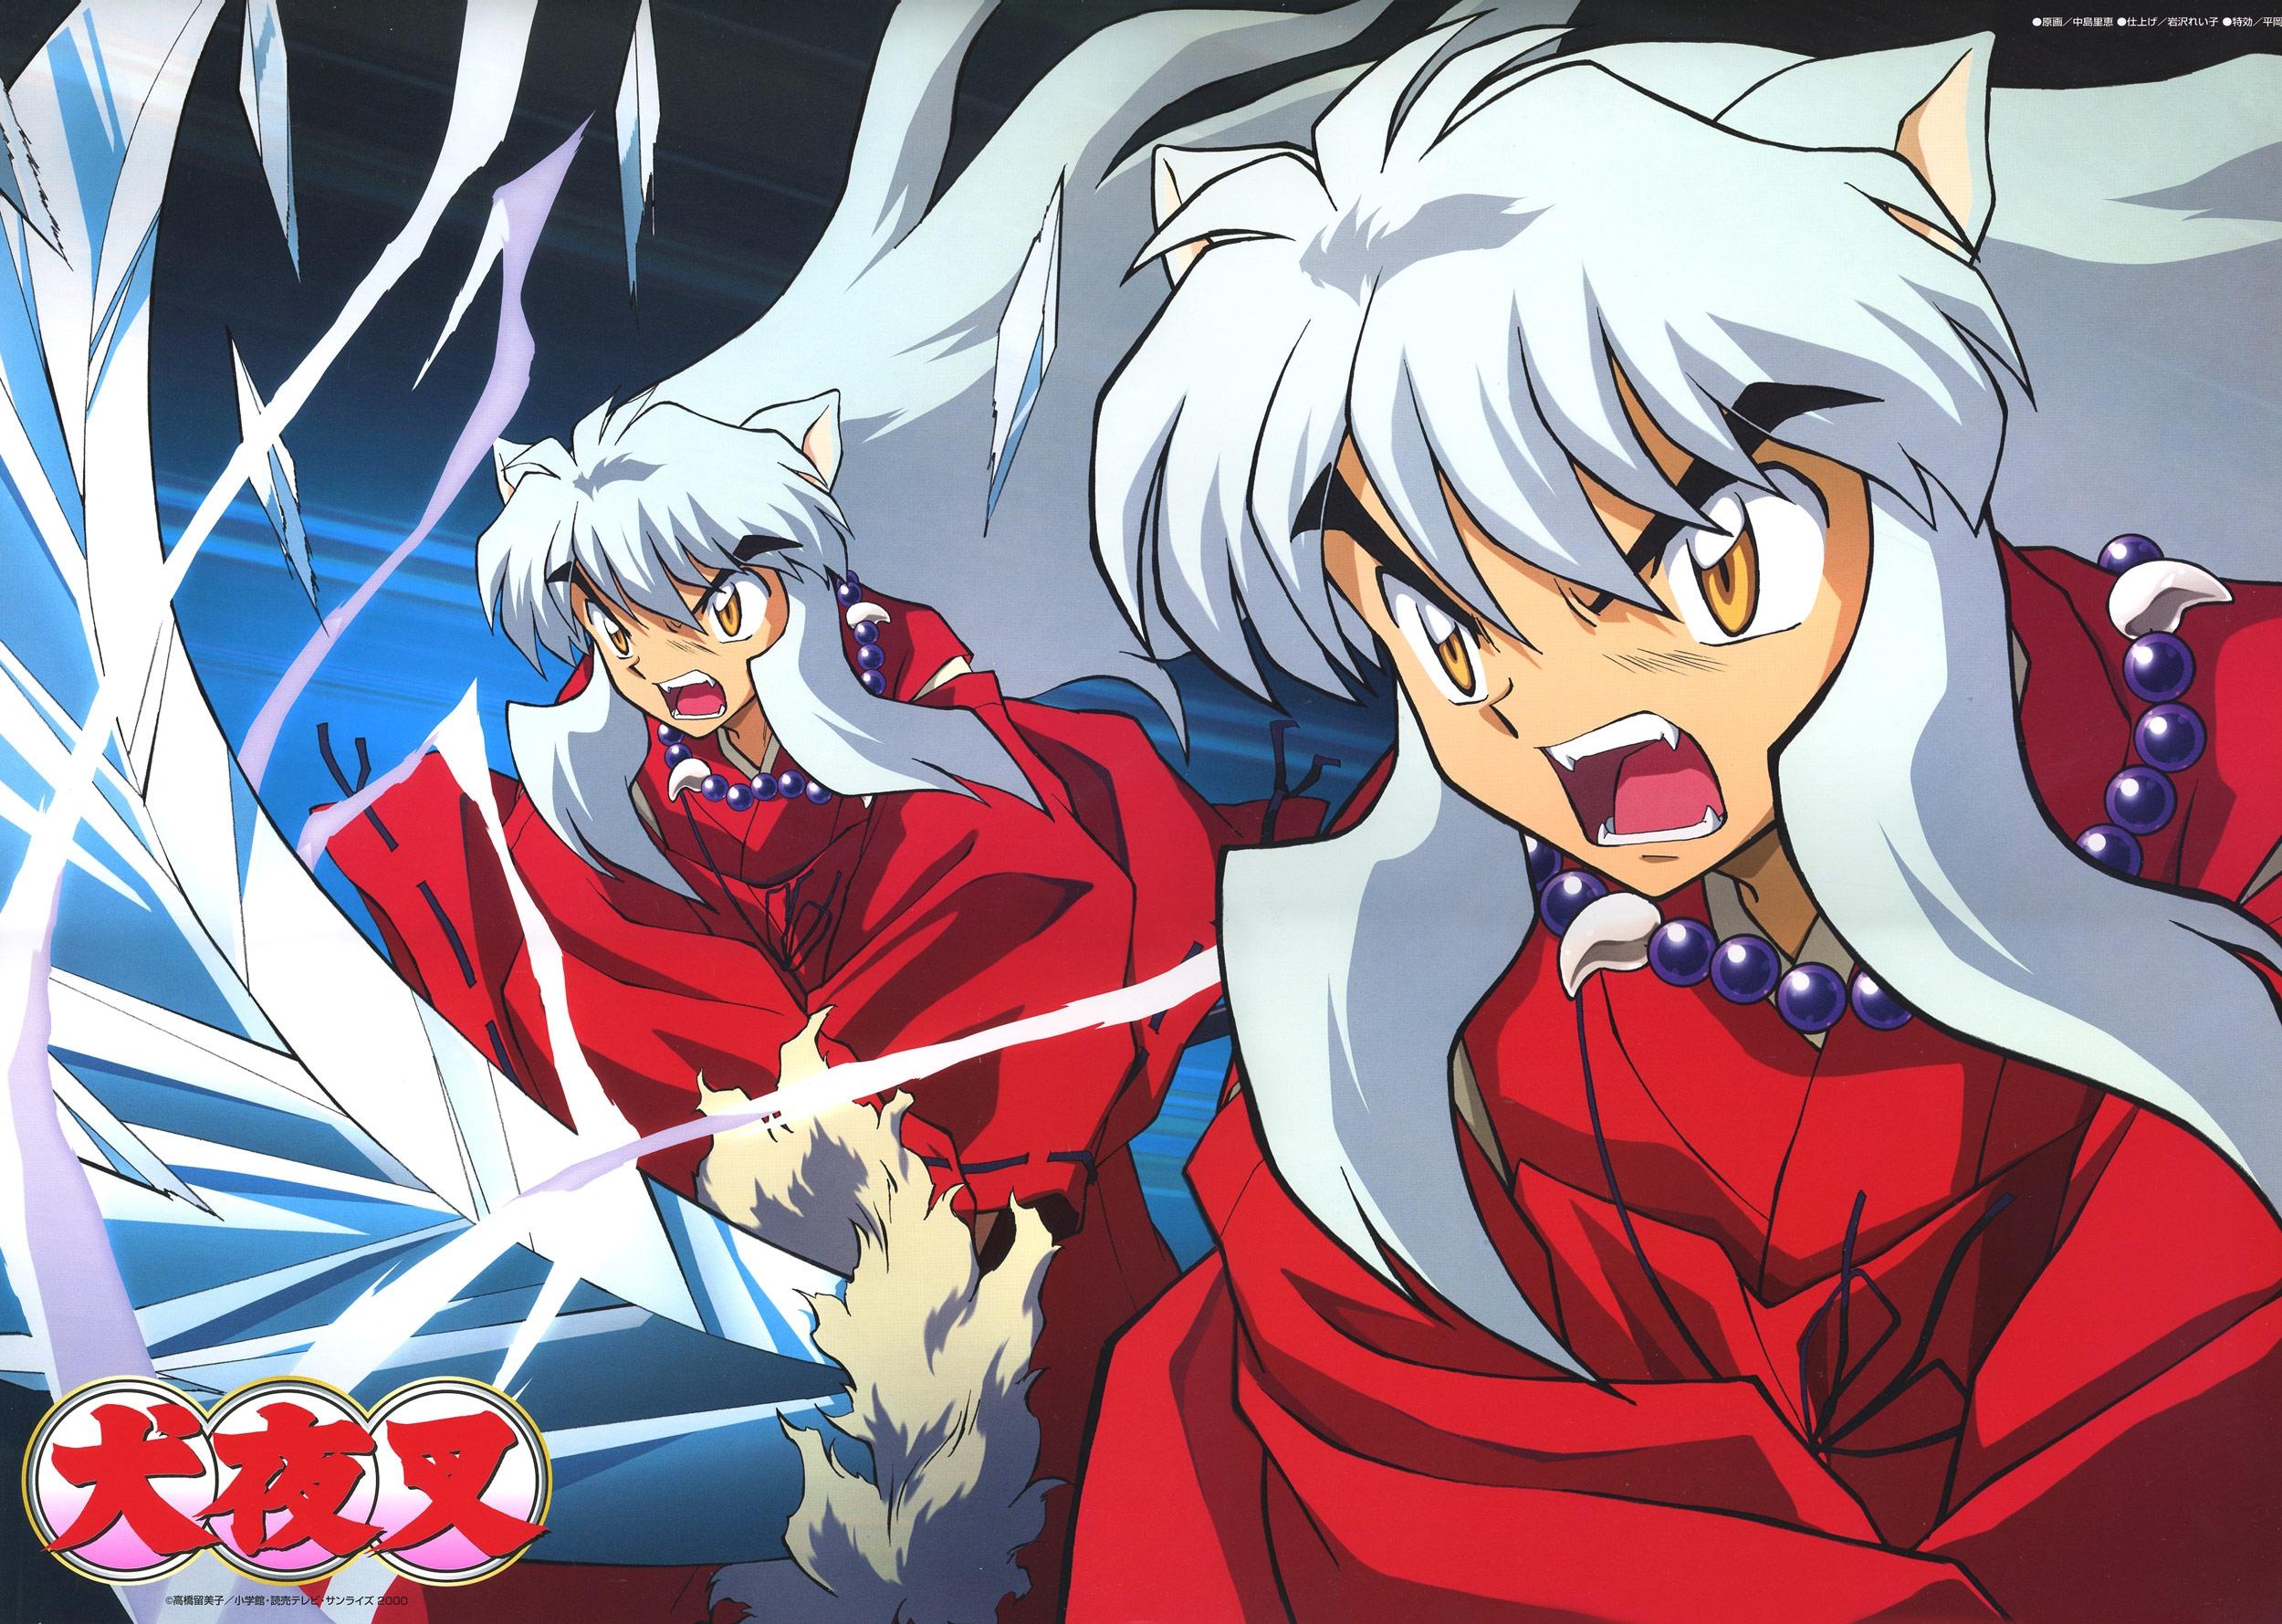 Wallpaper Inuyasha Girl Ears Scream Kick Sword 2500x1779